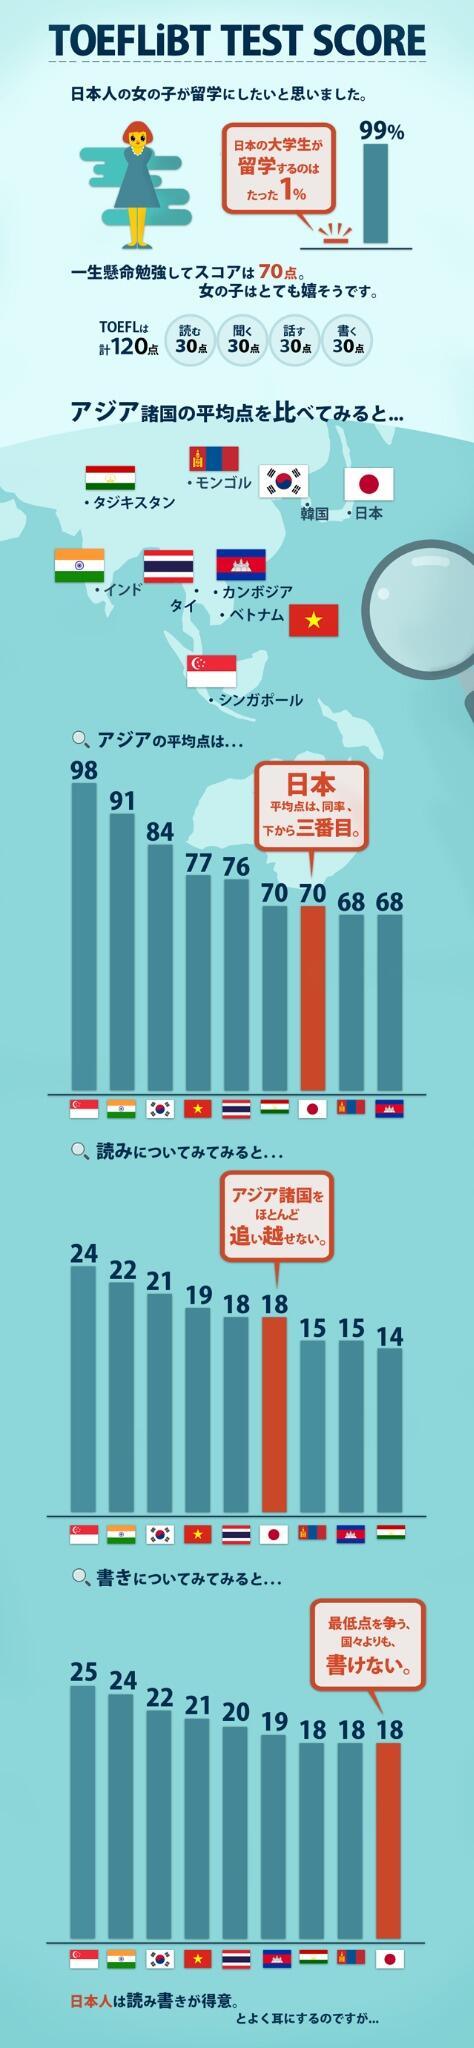 toefl_score_infographic.jpg